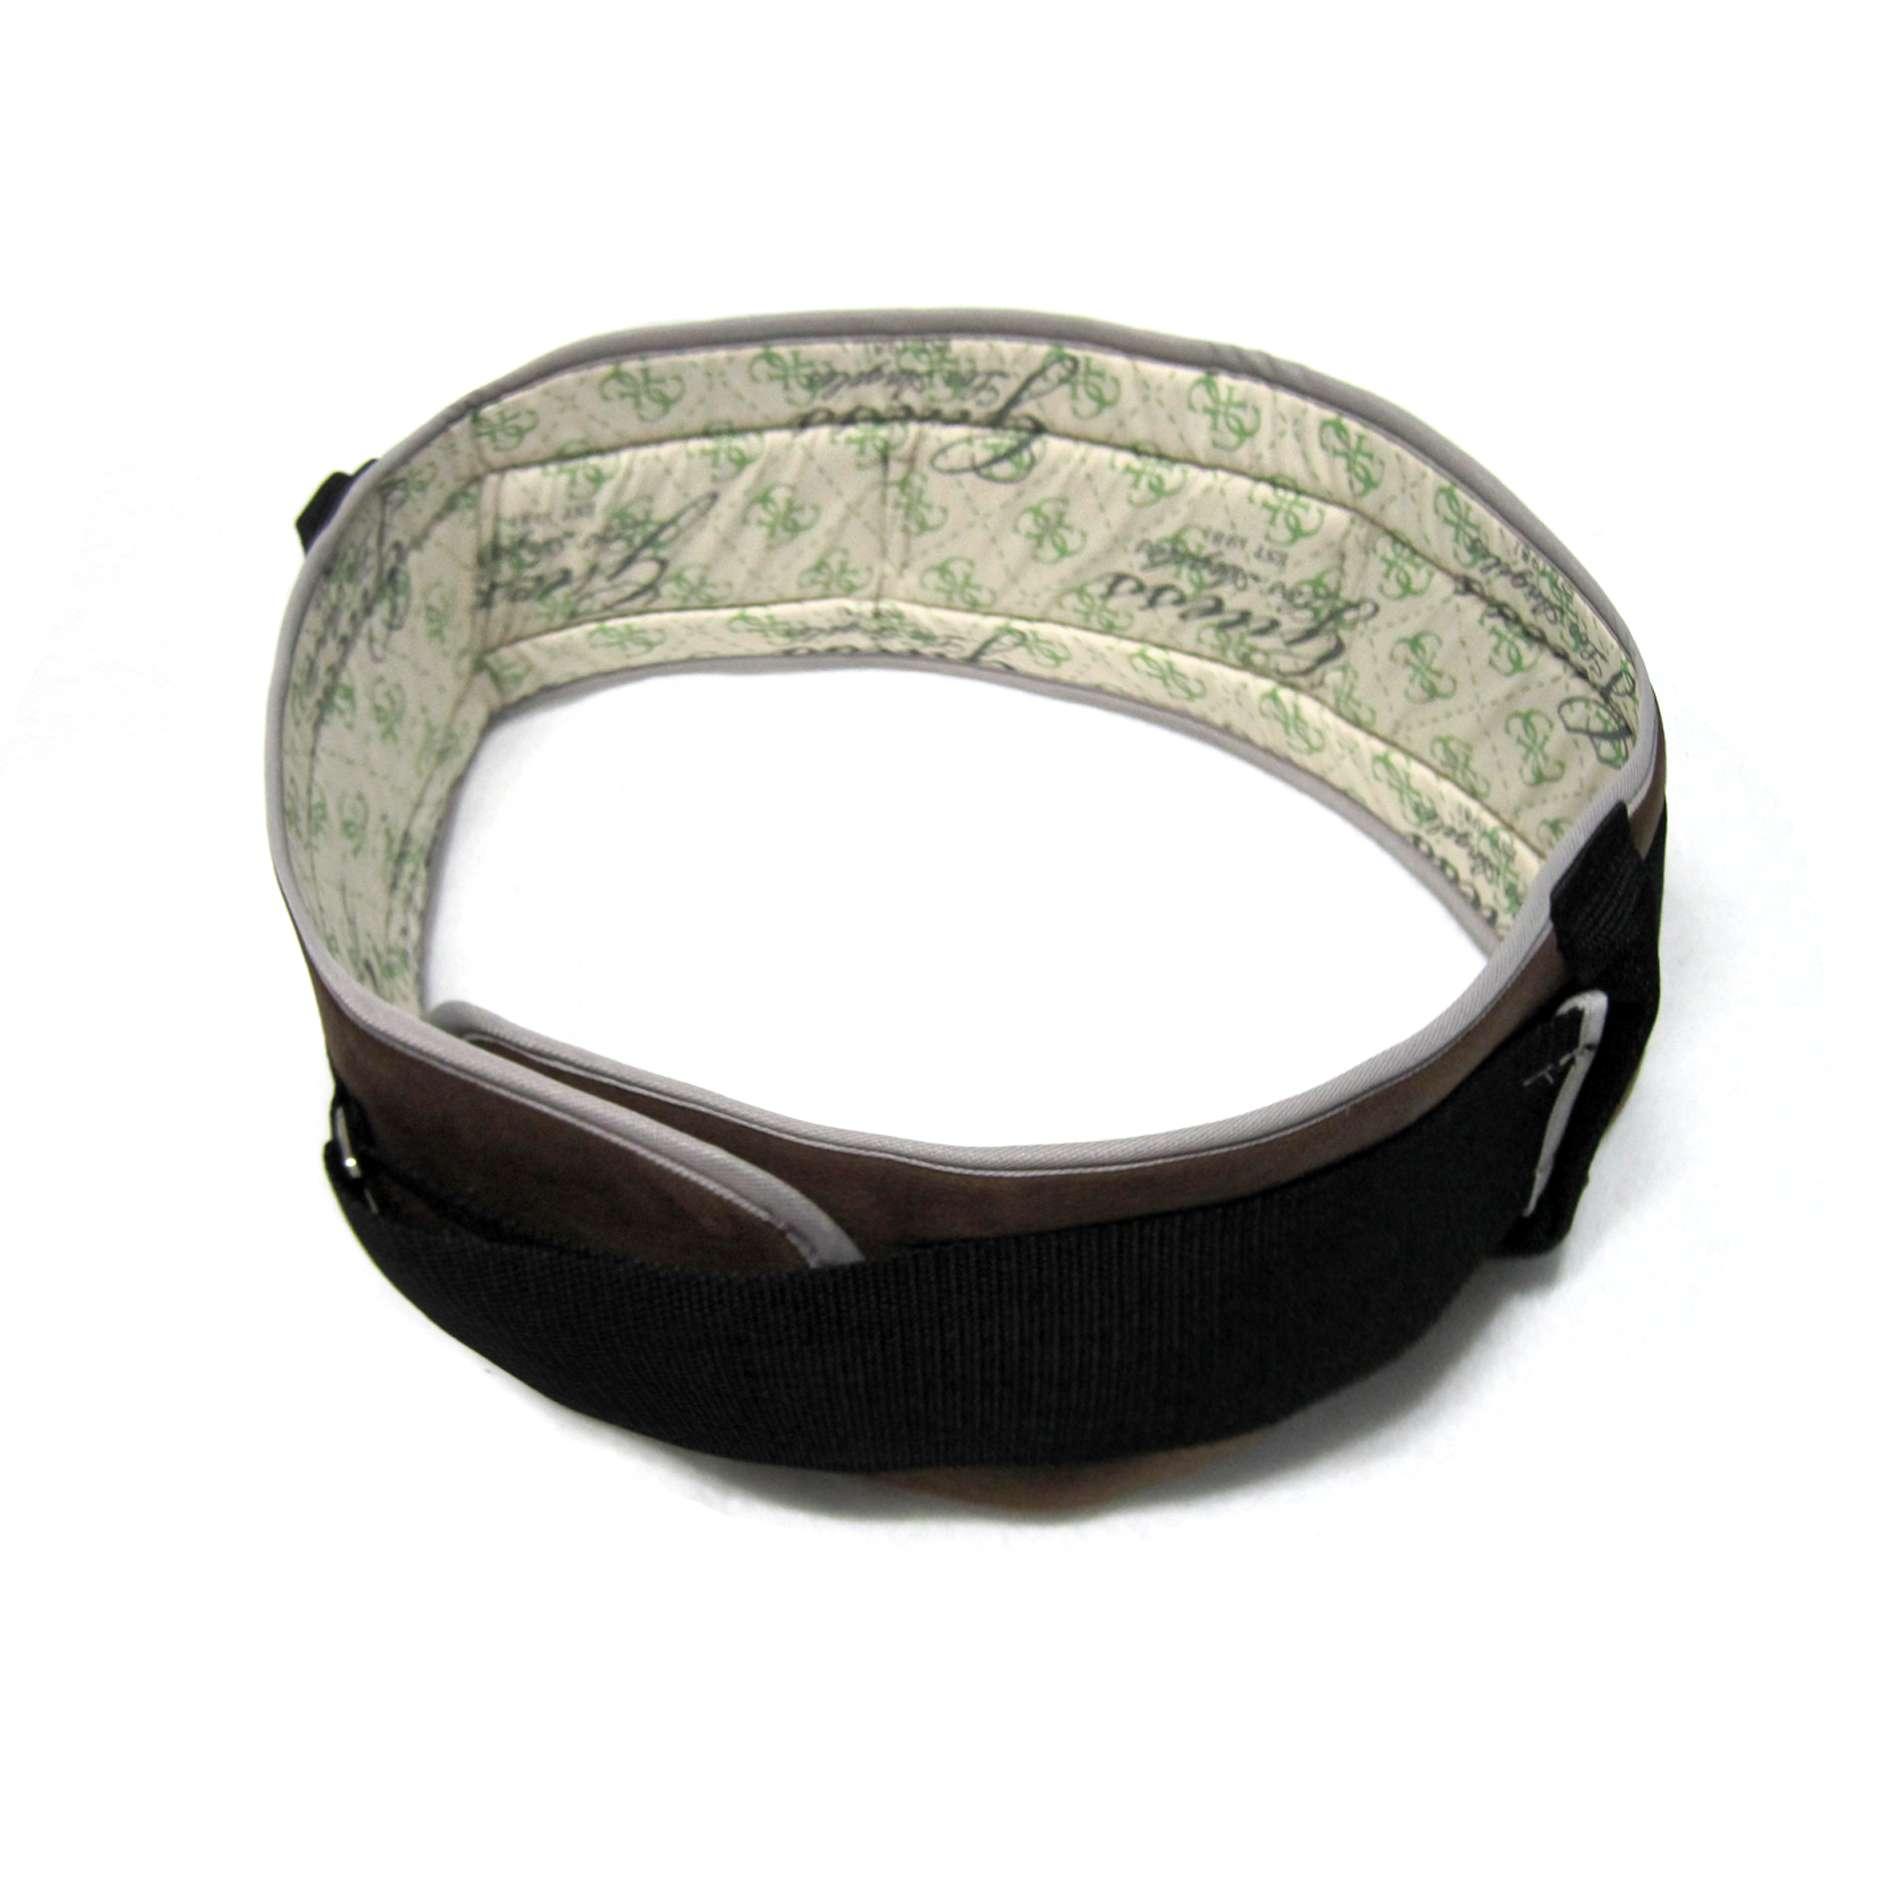 New Soft Padded Transfer Gait Belt Personal Waist Belt